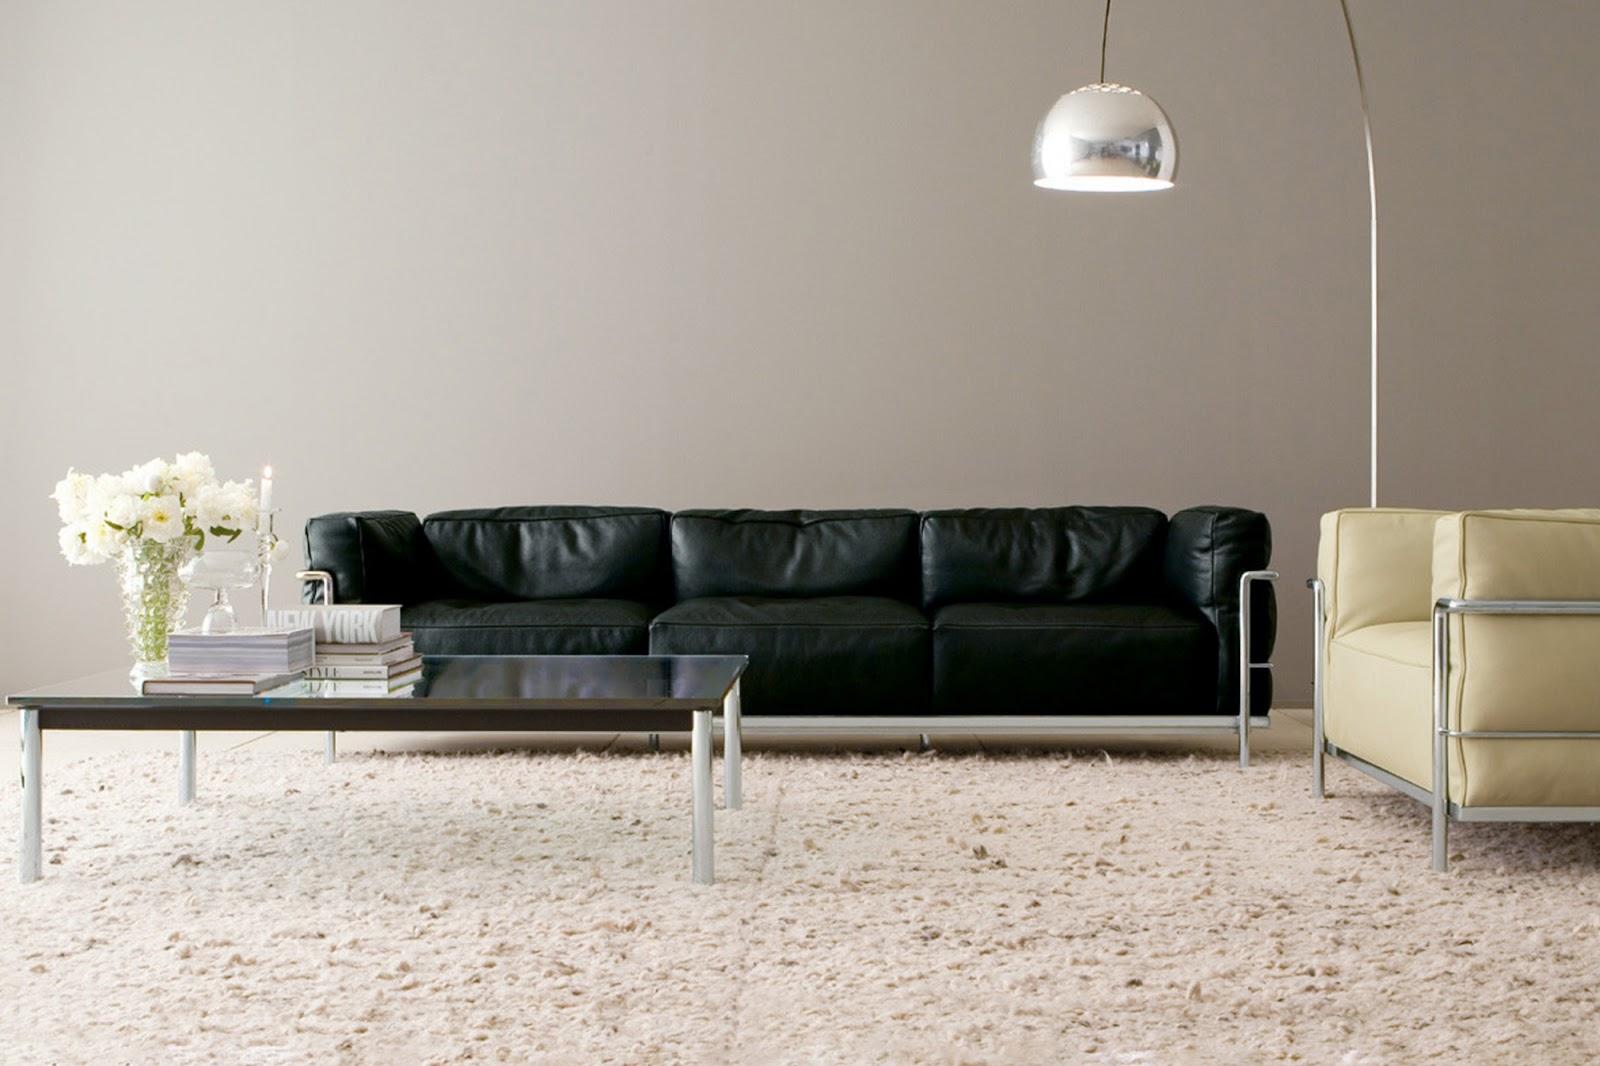 a black Grand Modele three-seat Sofa